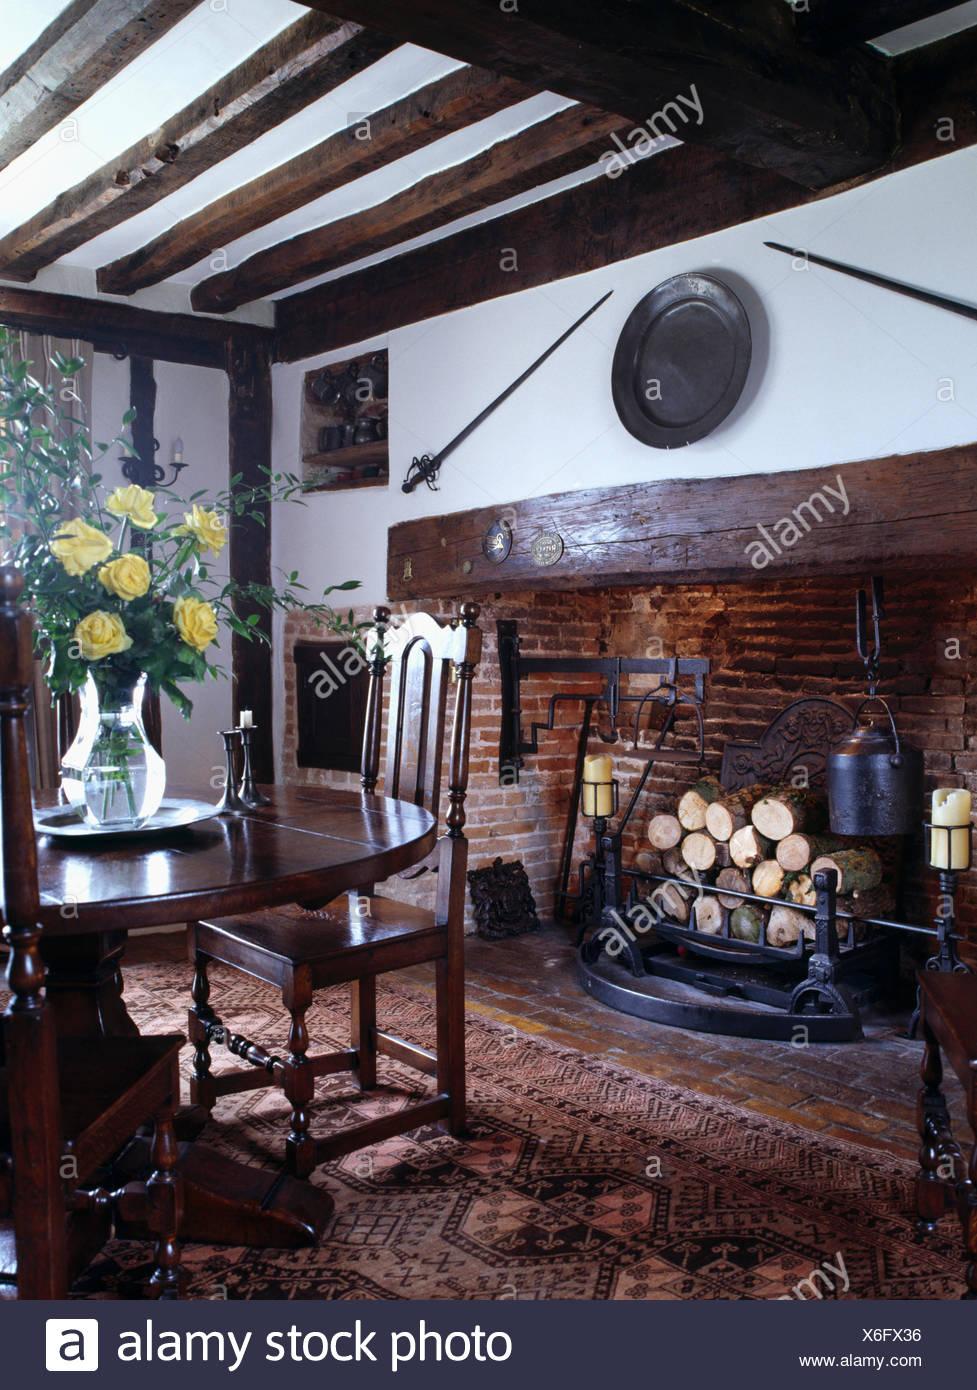 Tudor Fireplace Imágenes De Stock & Tudor Fireplace Fotos De Stock ...